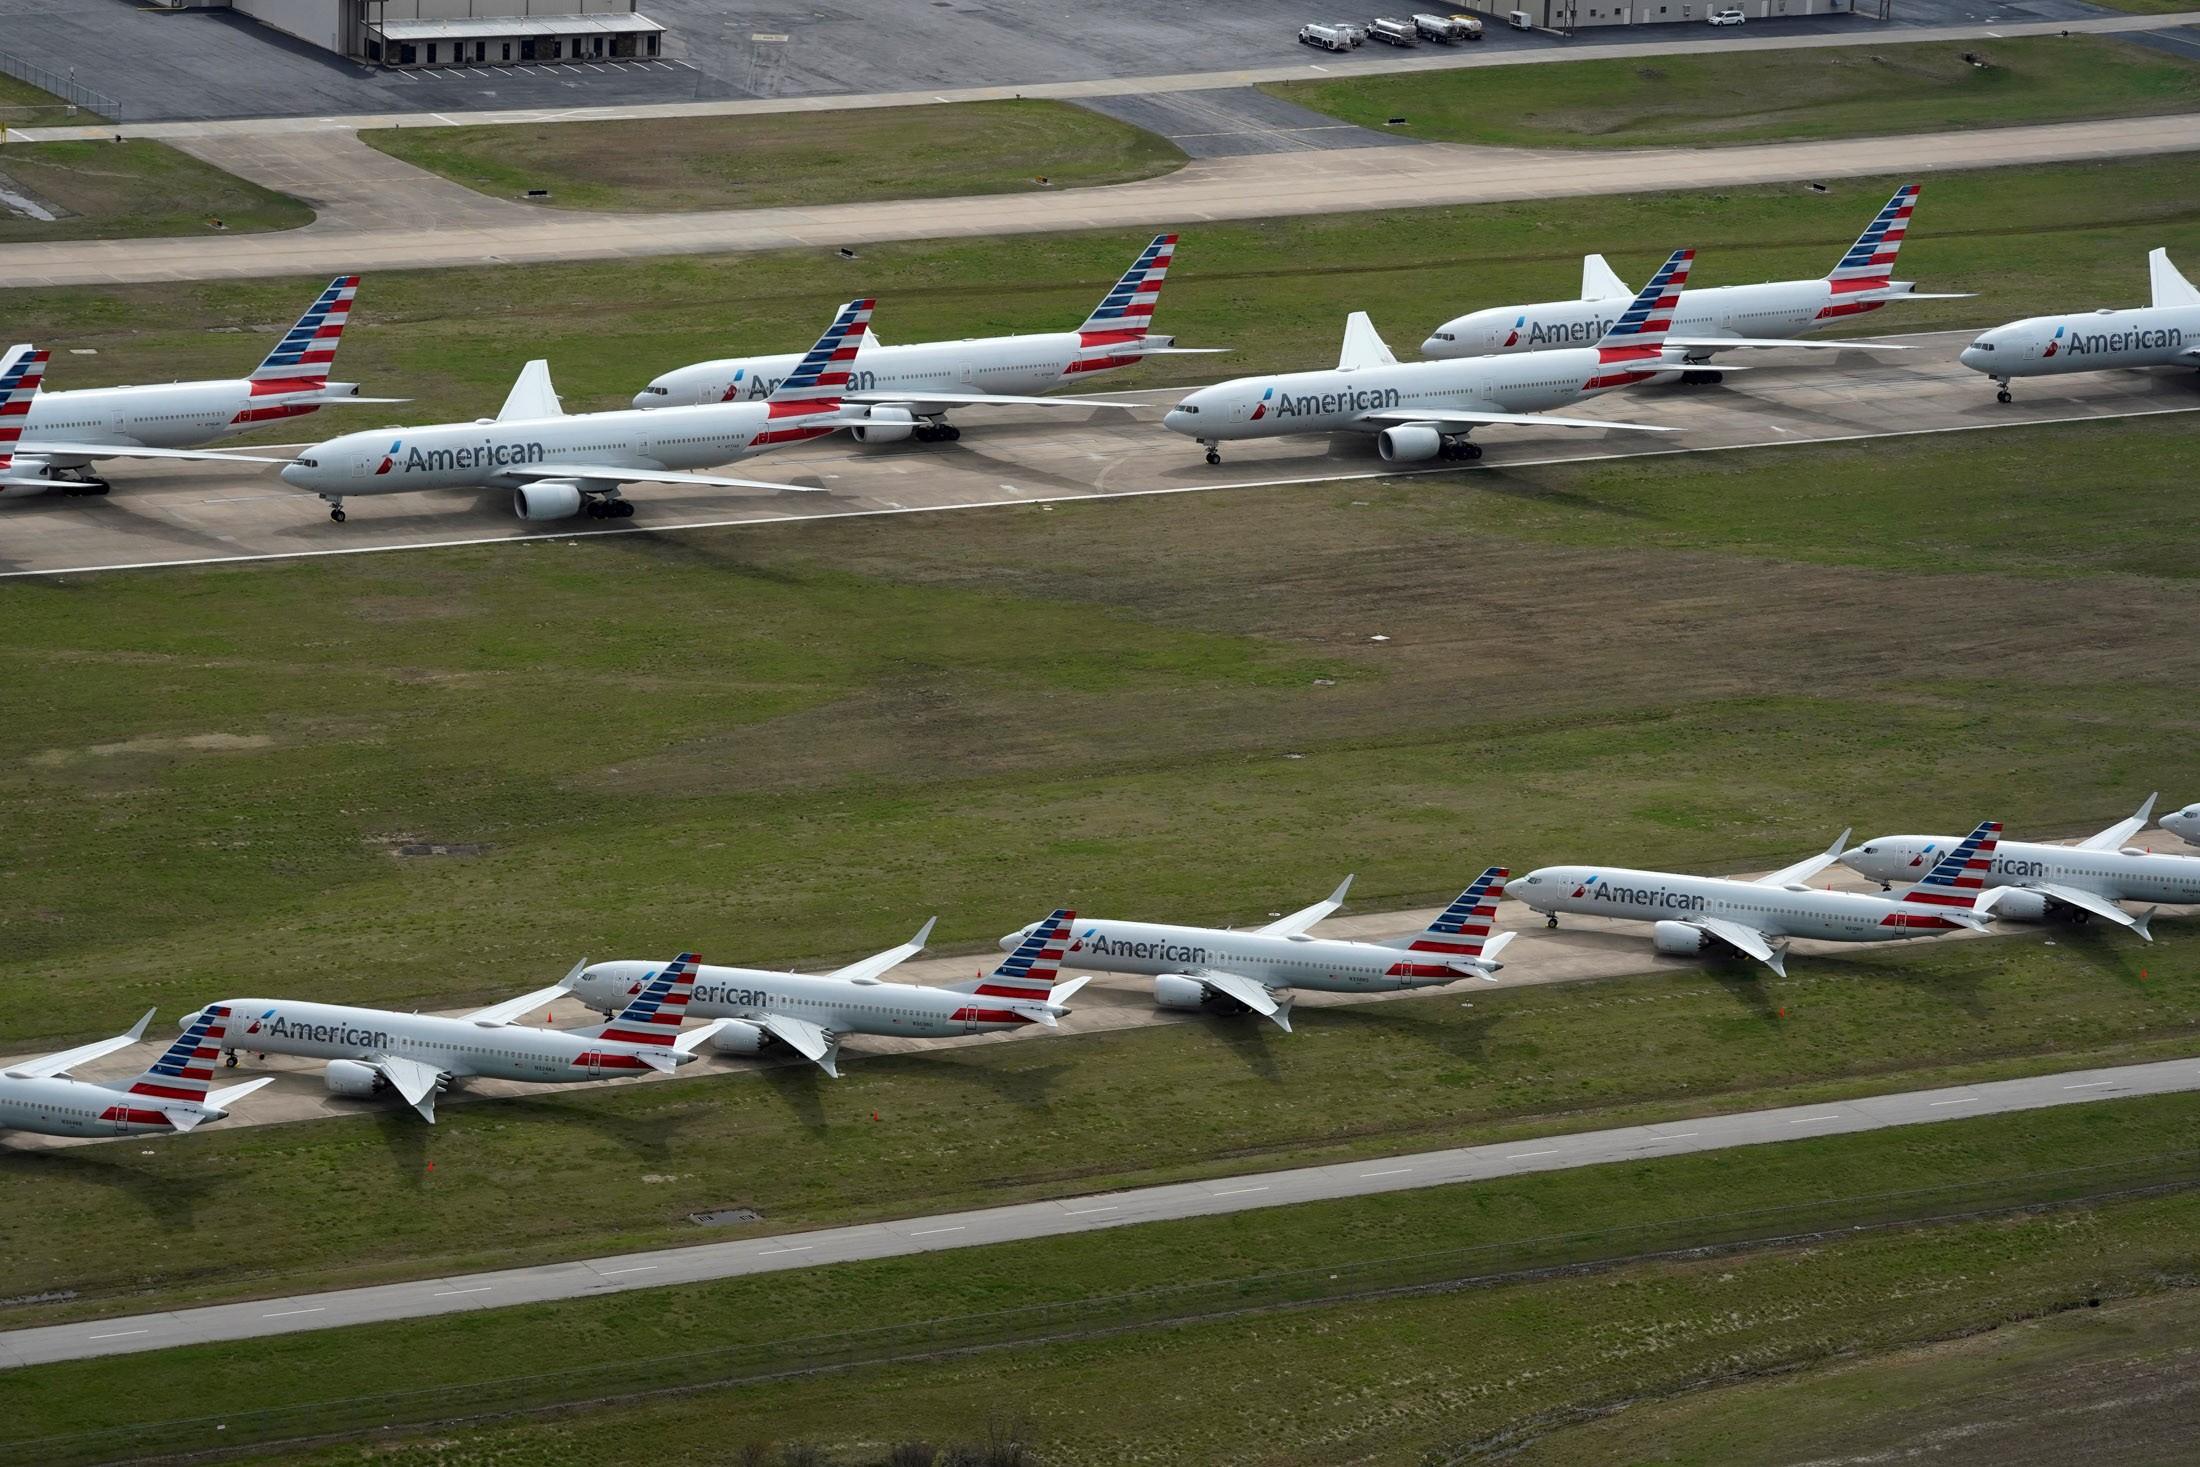 American Airlines e United anunciam mais de 30 mil demissões devido a pandemia